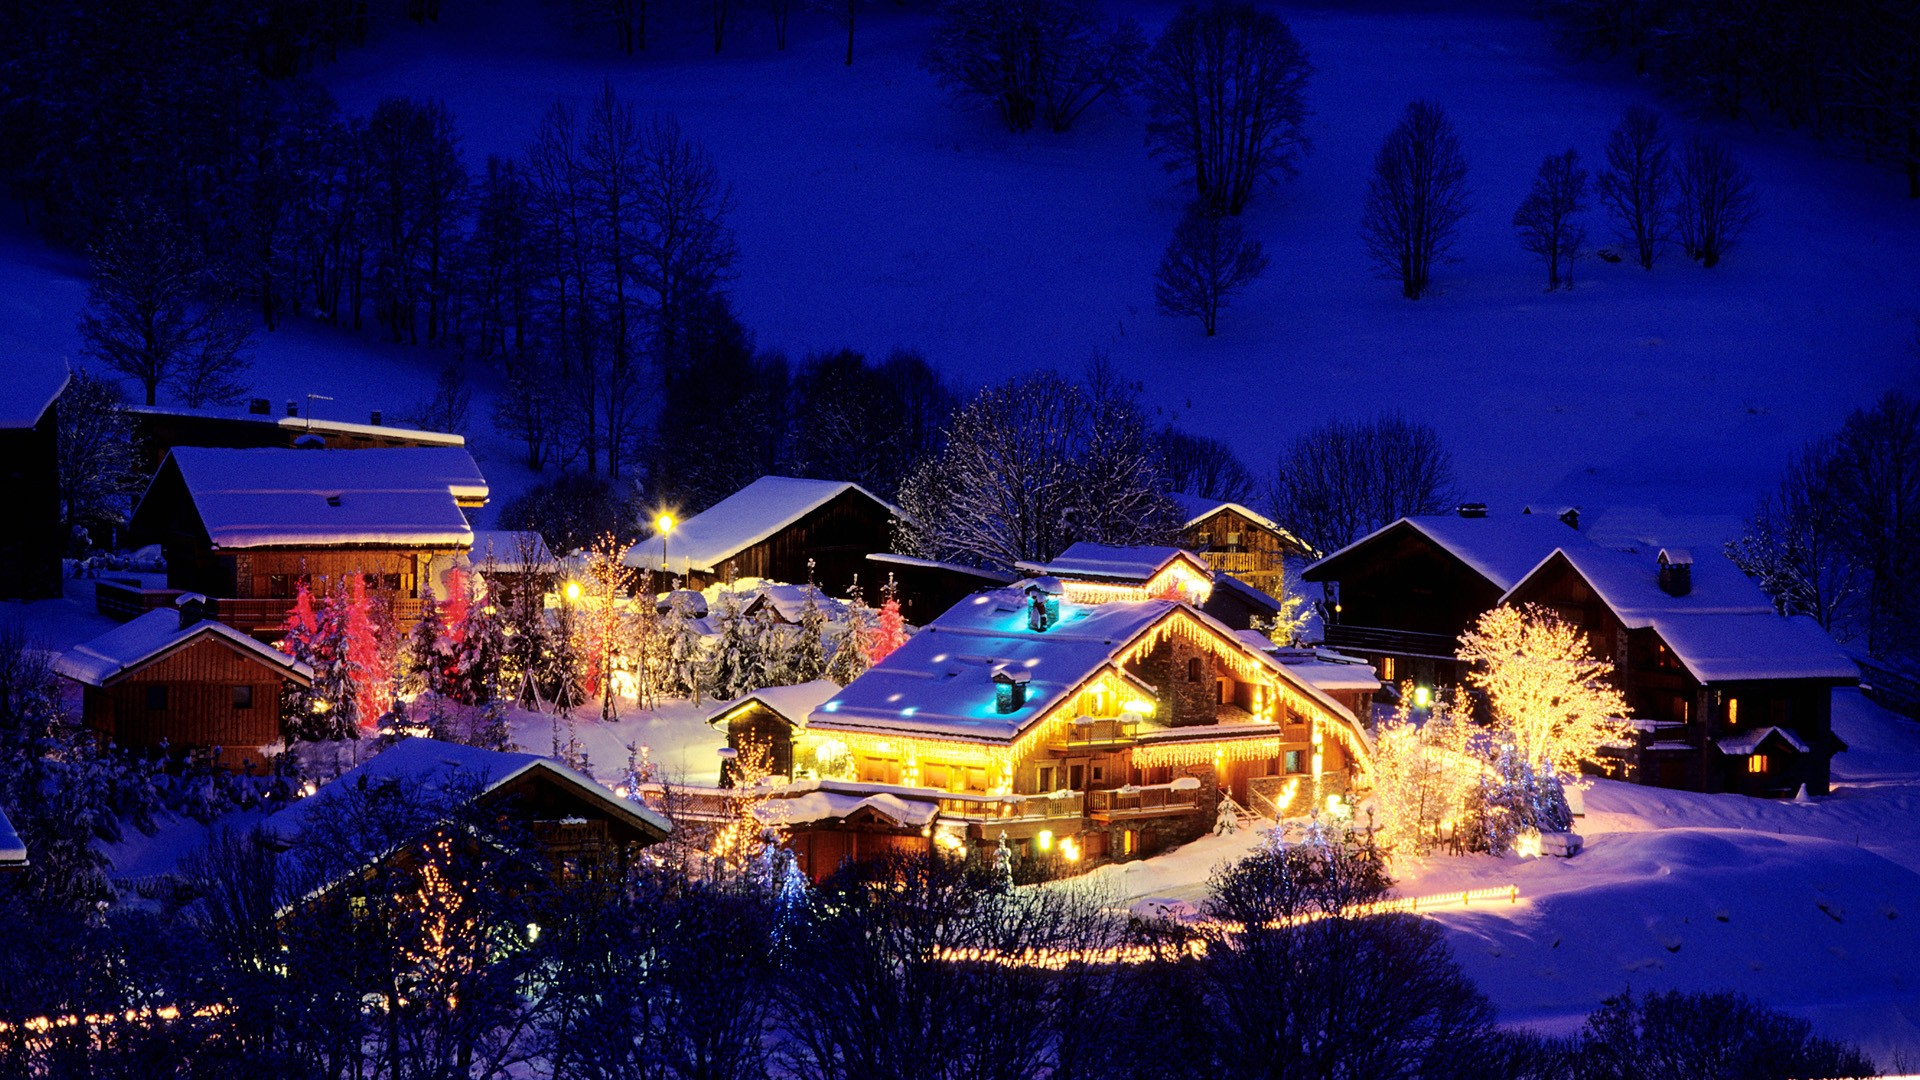 France Christmas Wallpaper 1920x1080 France Christmas Ski Resort 1920x1080